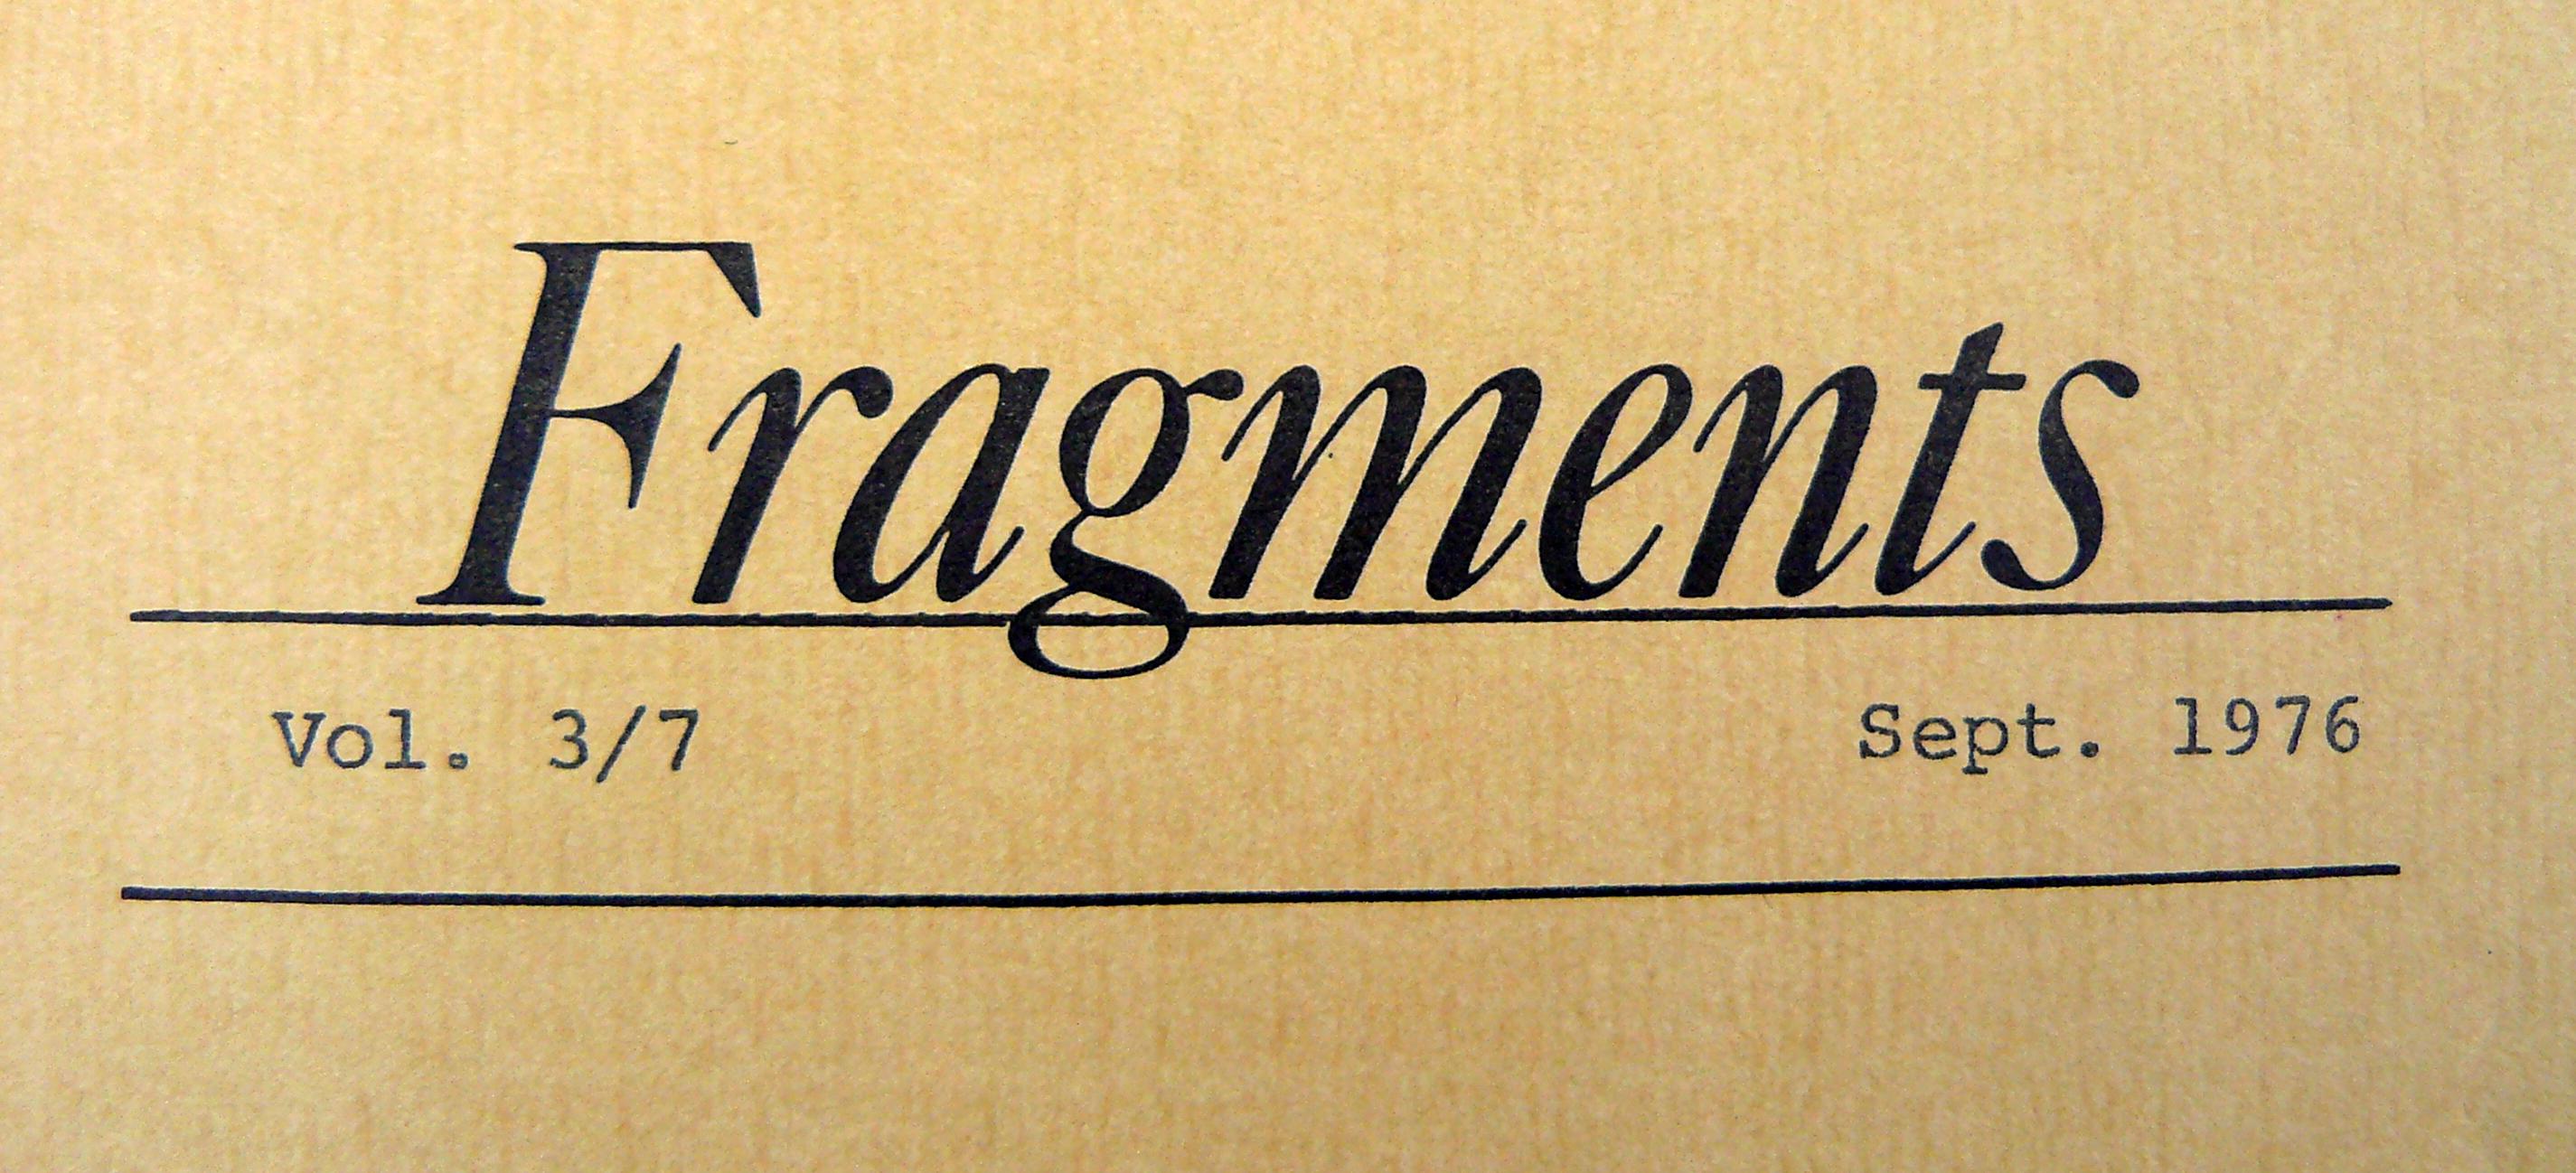 "<div class='inner-box'><div class='close-desc'></div><span class='opis'>Winieta pisma ""Fragments""</span><div class='clearfix'></div><span>Sygn. sm00221</span><div class='clearfix'></div><span>© Instytut Literacki</span></div>"